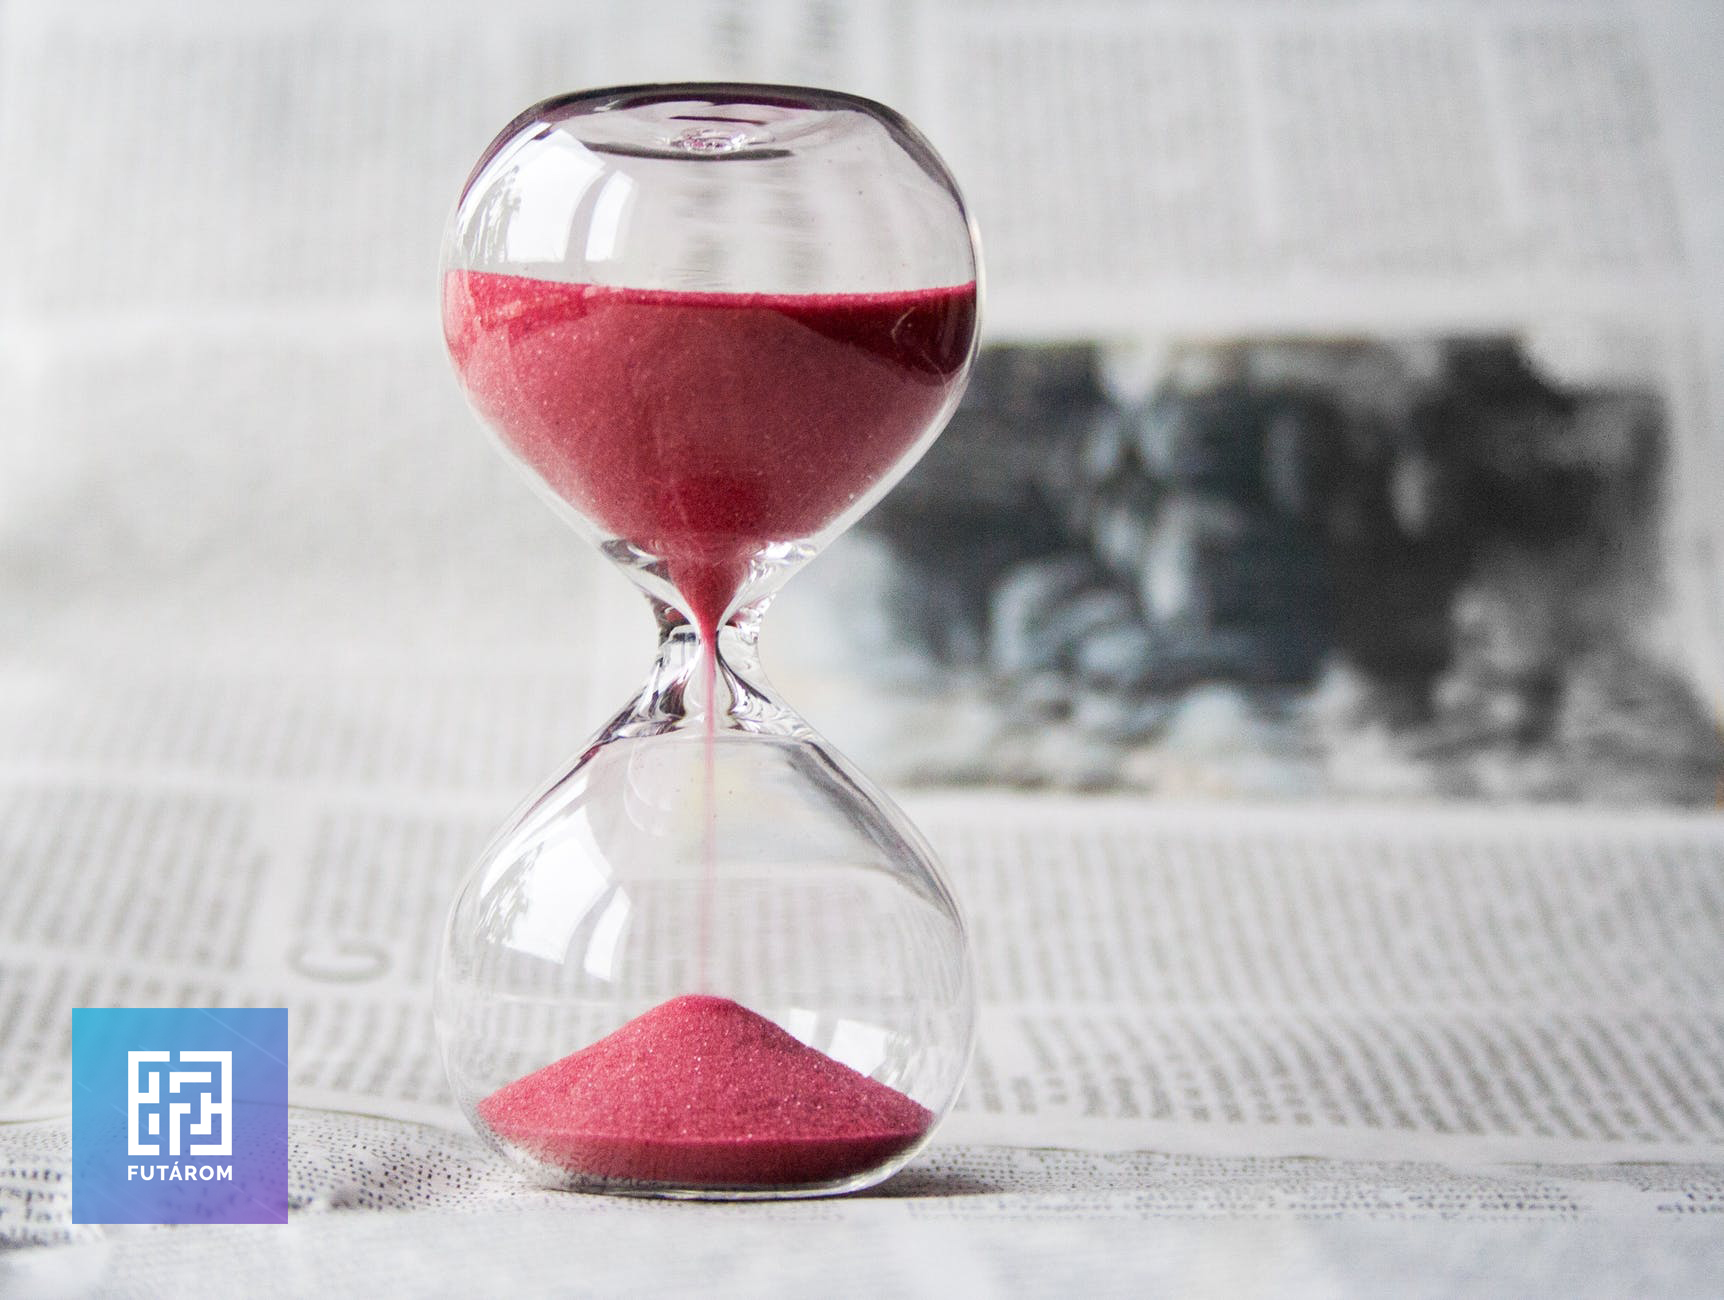 hourglass-time-hours-sand-39396.jpg